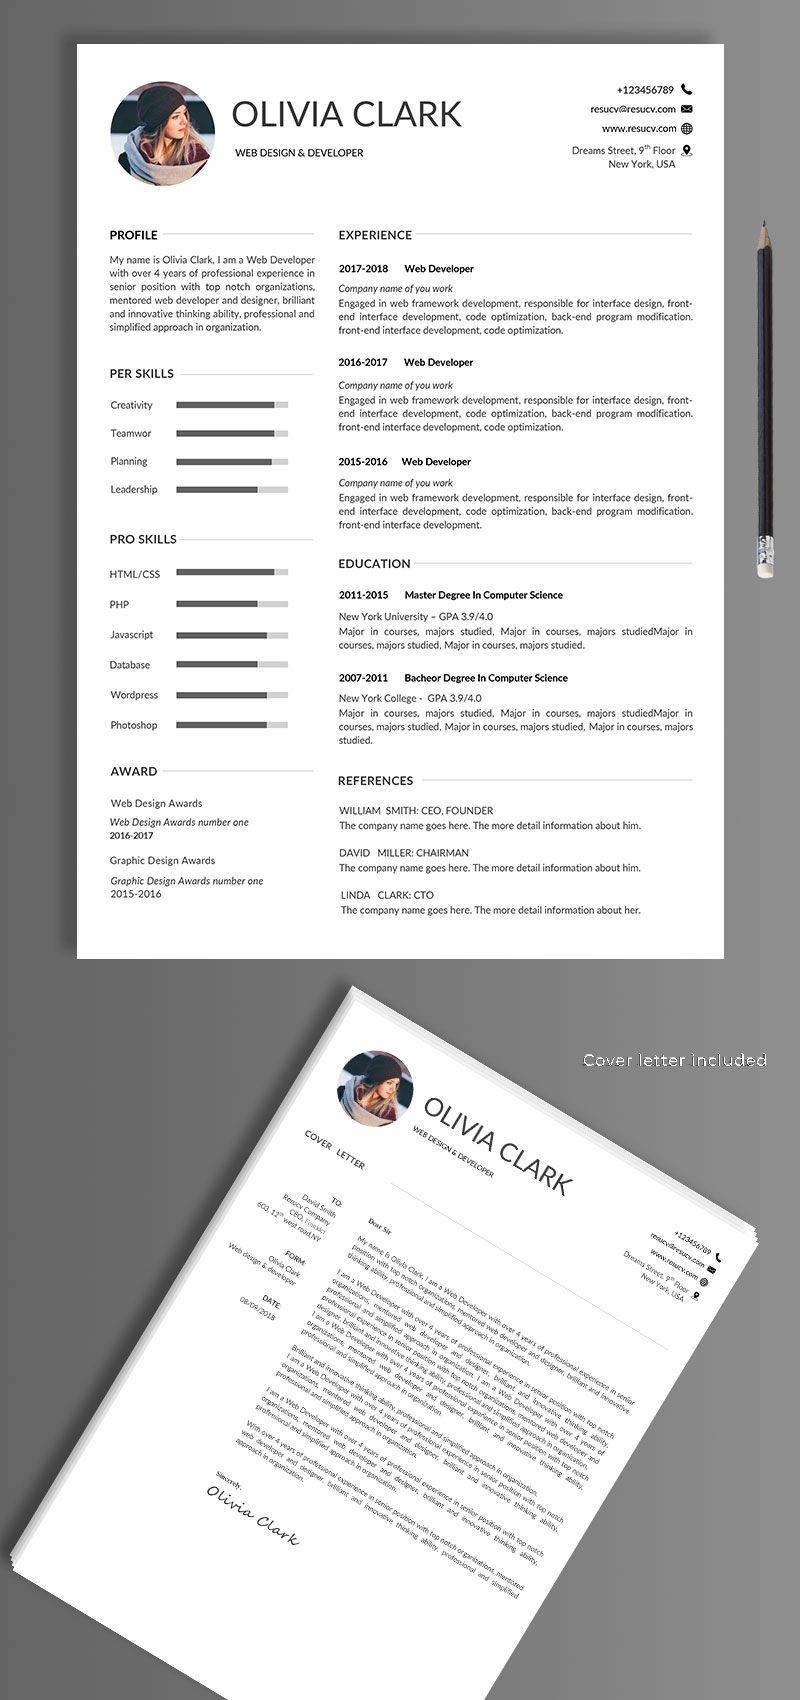 Easy Resume Examples Easy Resume Template Education Resume Simle Resume Effective Resume Effective Resum Cv Template Cover Letter Example Administrative Resume